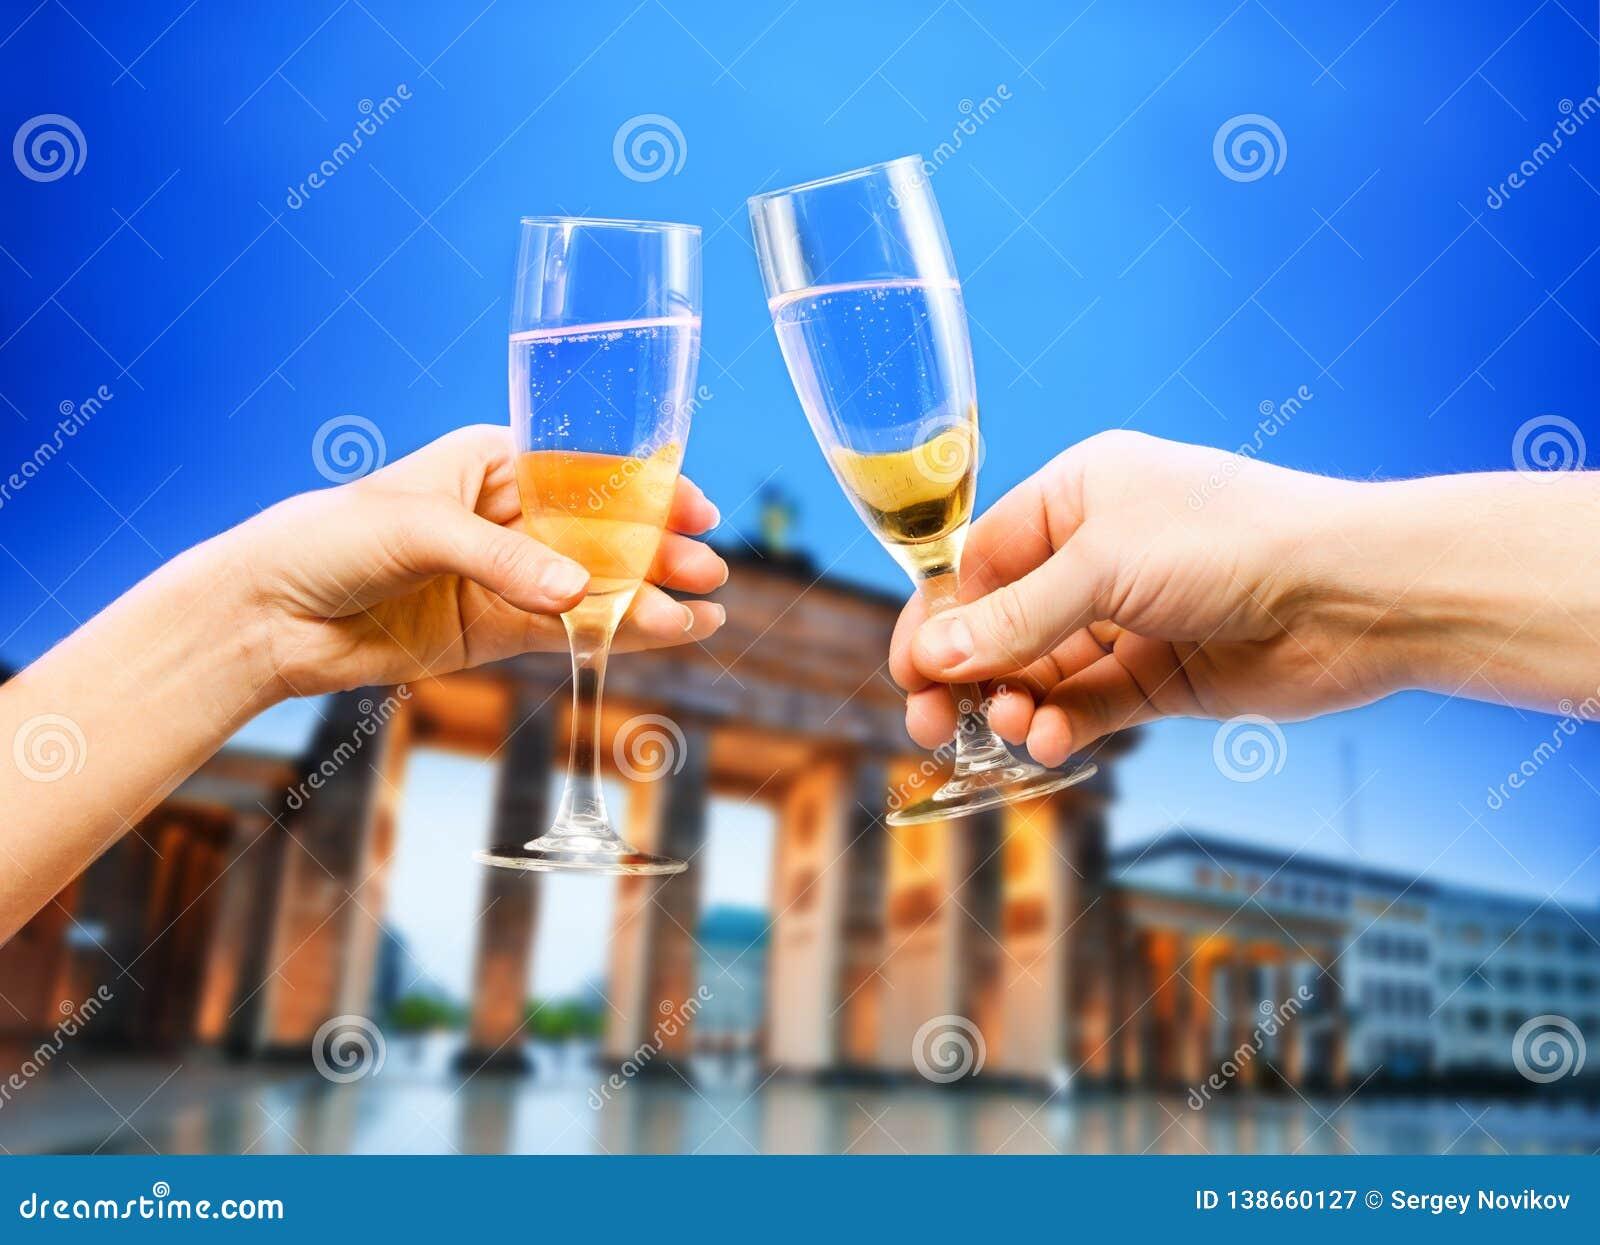 Berlin Germany Brandenburg, vidrios de champán, técnicas mixtas